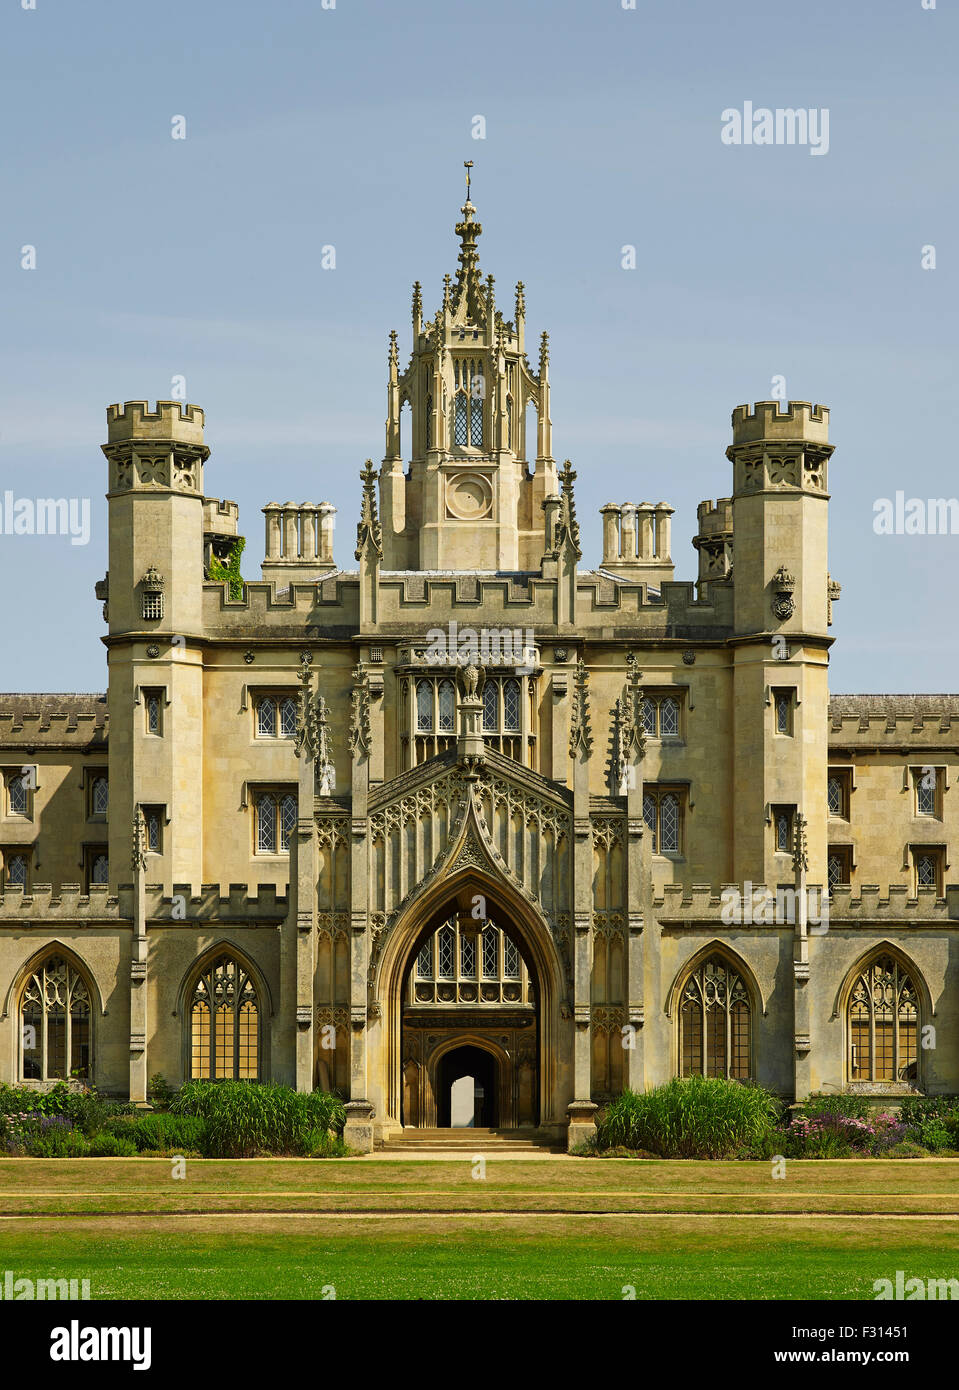 Cambridge, St John's College, New Court, entrance screen Stock Photo